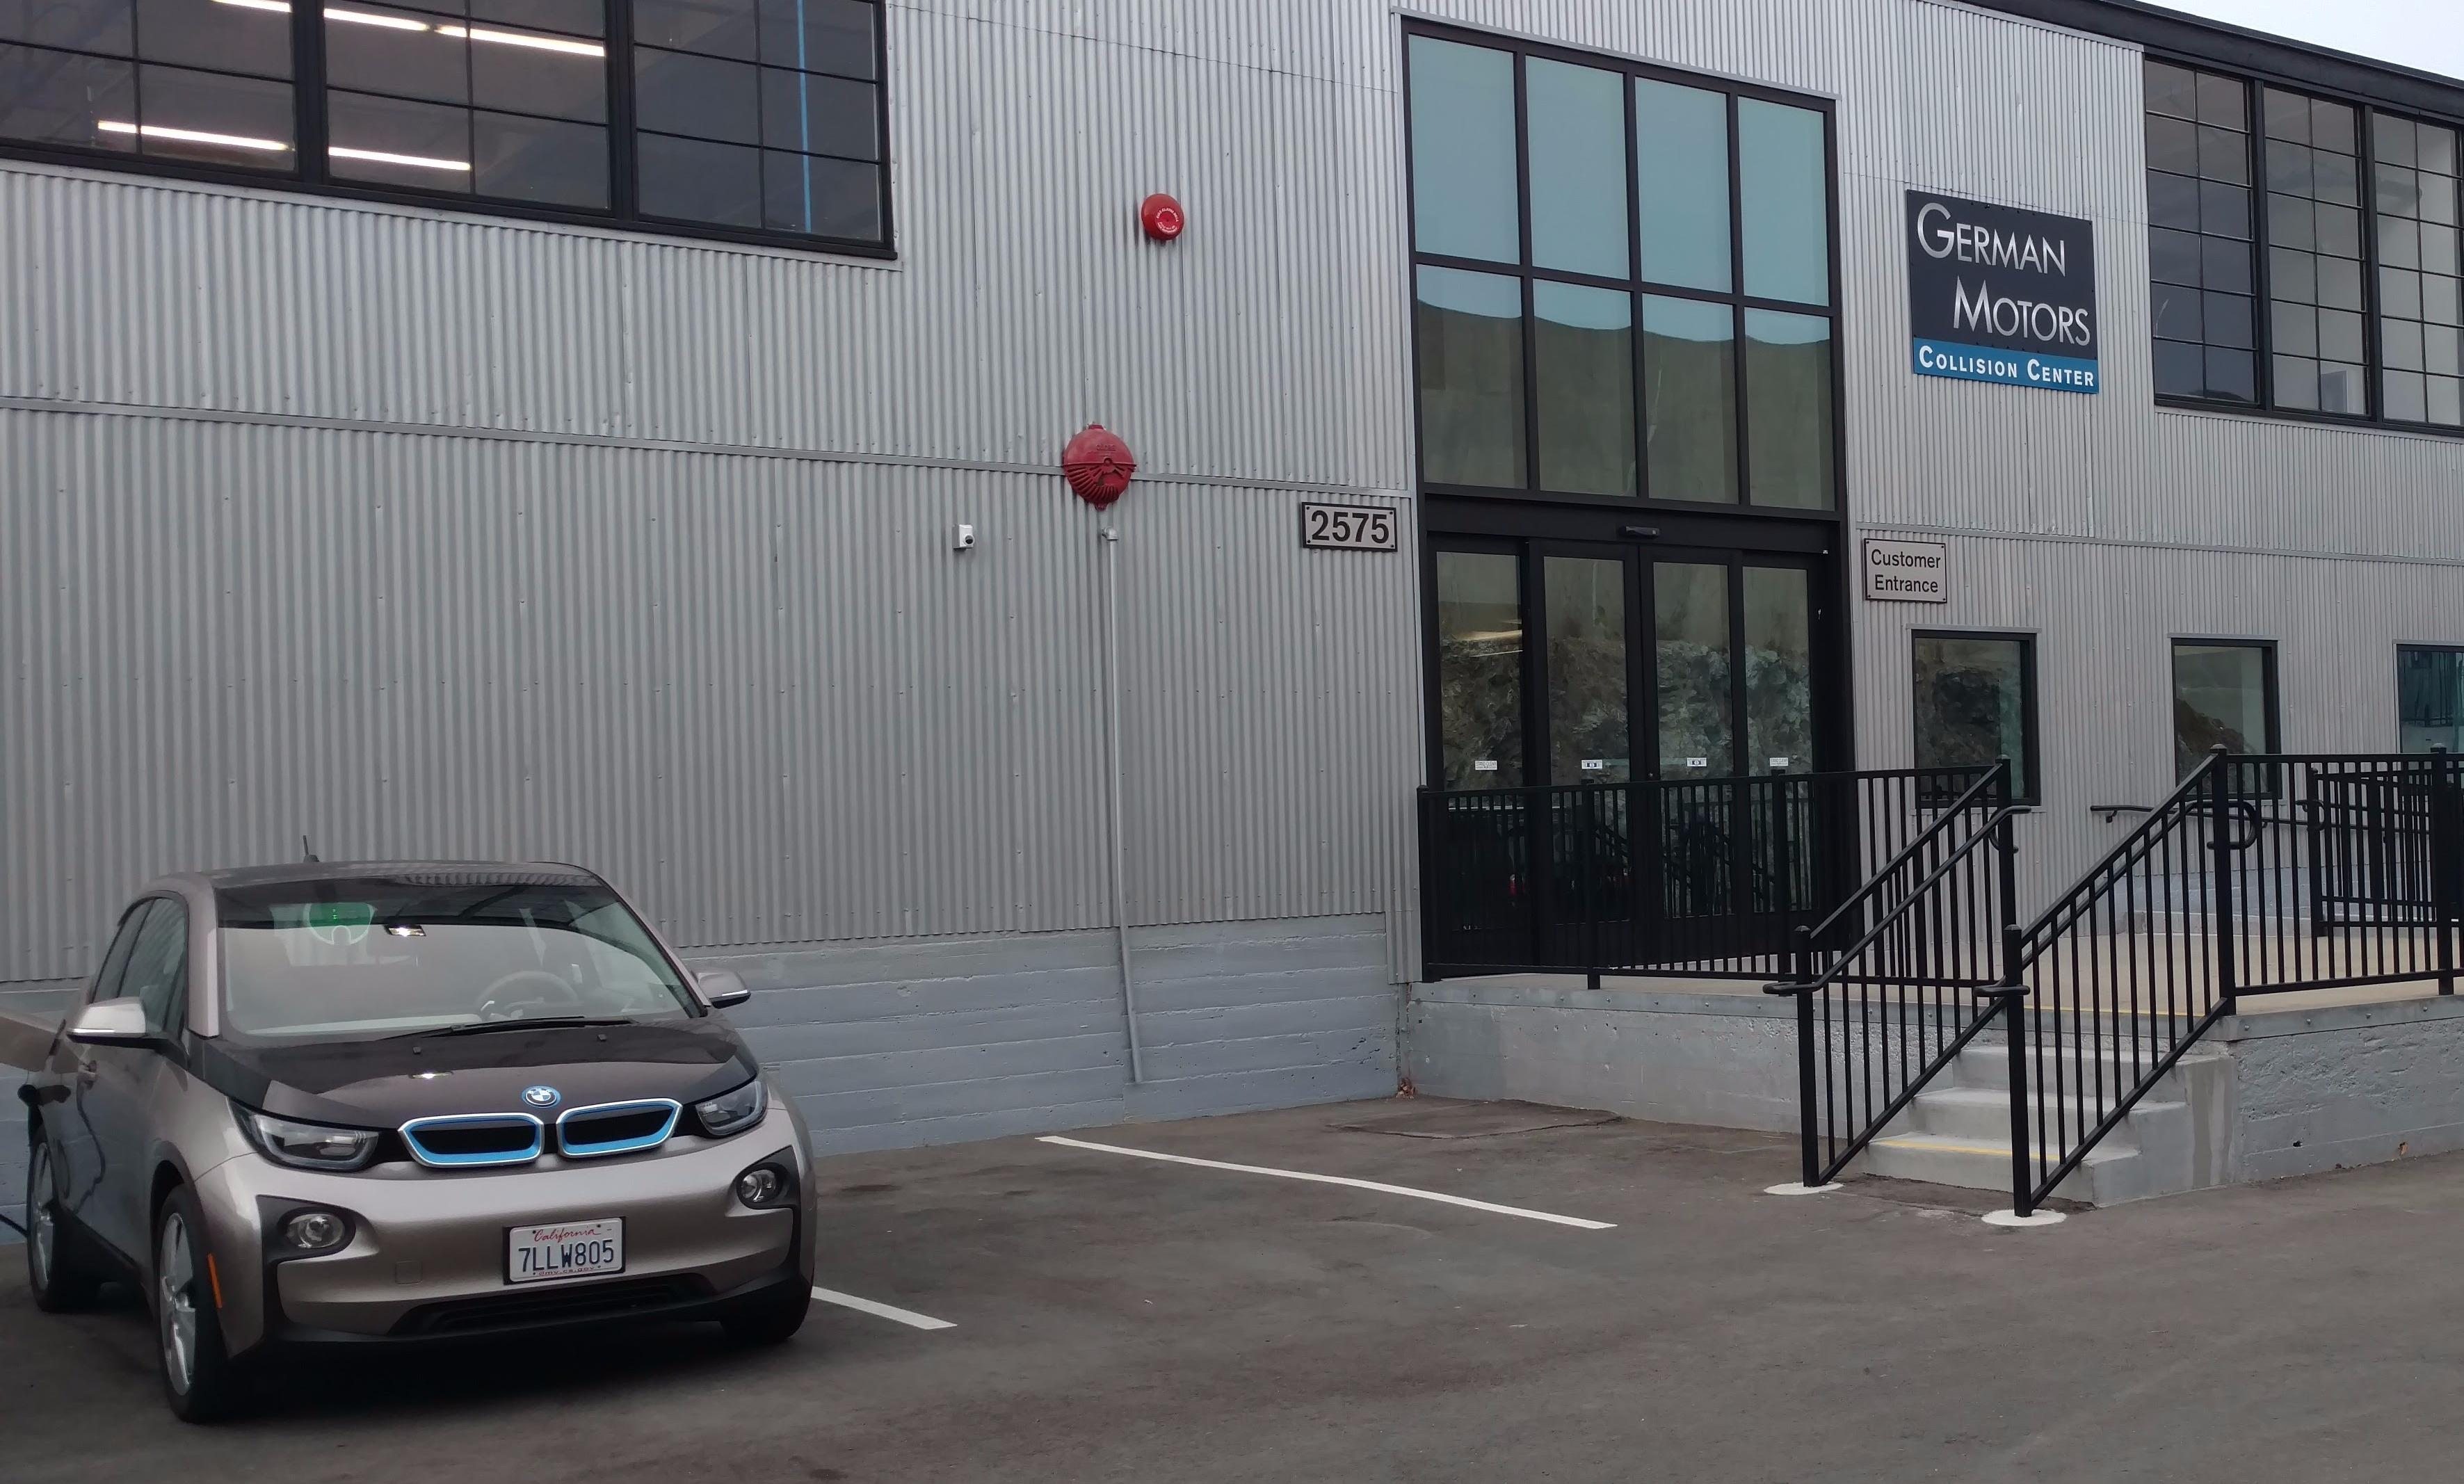 German Motors Collision Center 2575 Marin Street San Francisco Ca N49 Com